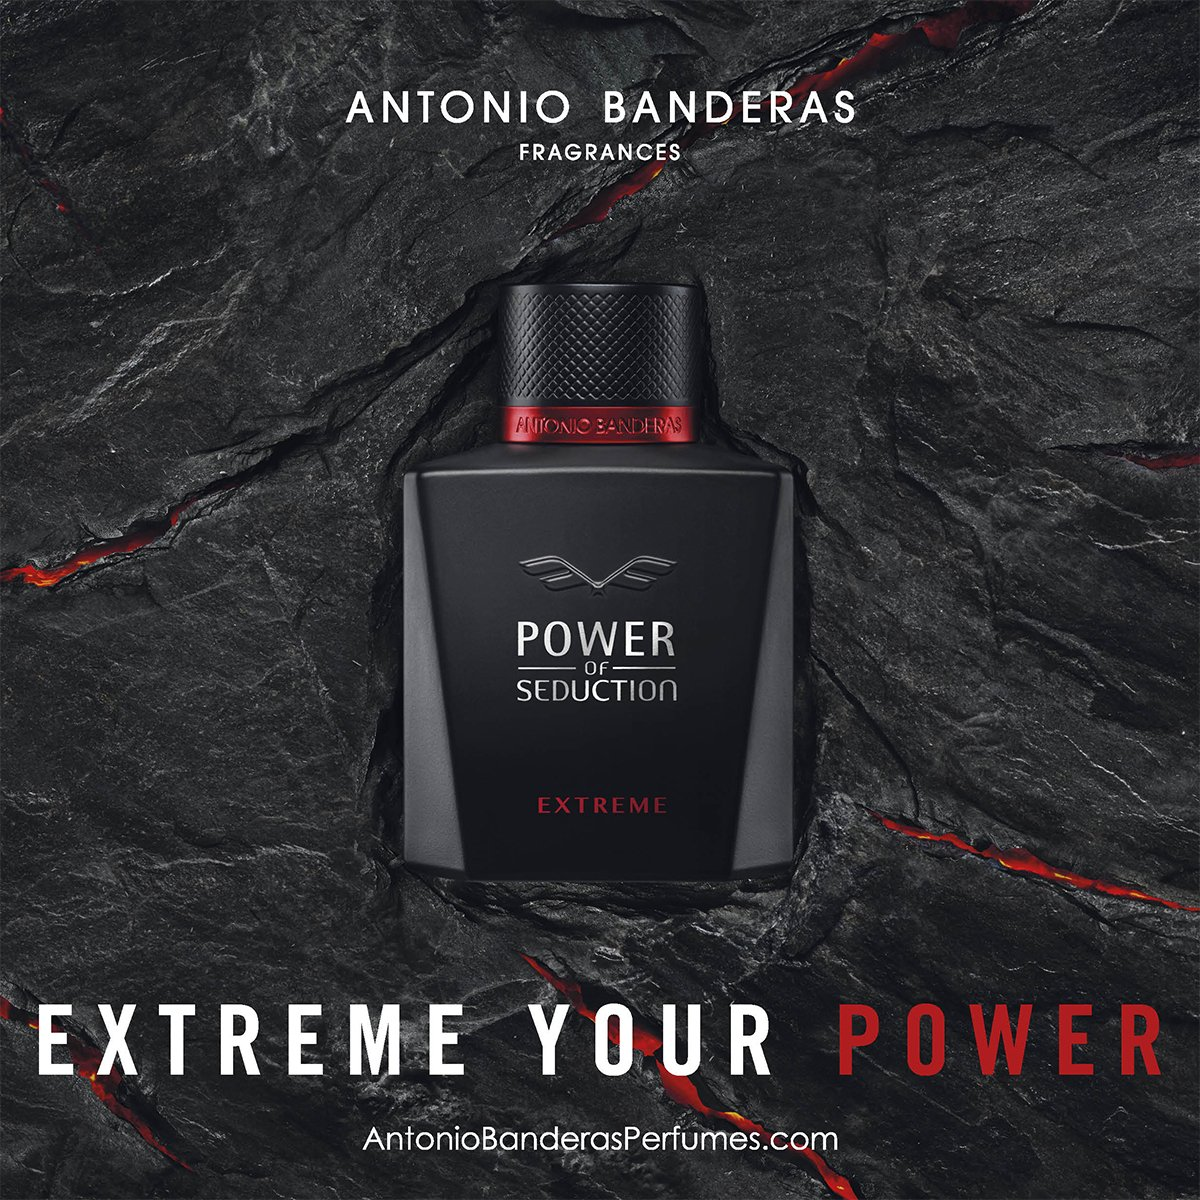 Fragancia para Caballero, Antonio Banderas Power Of Seduction Extreme Edt 100 Ml